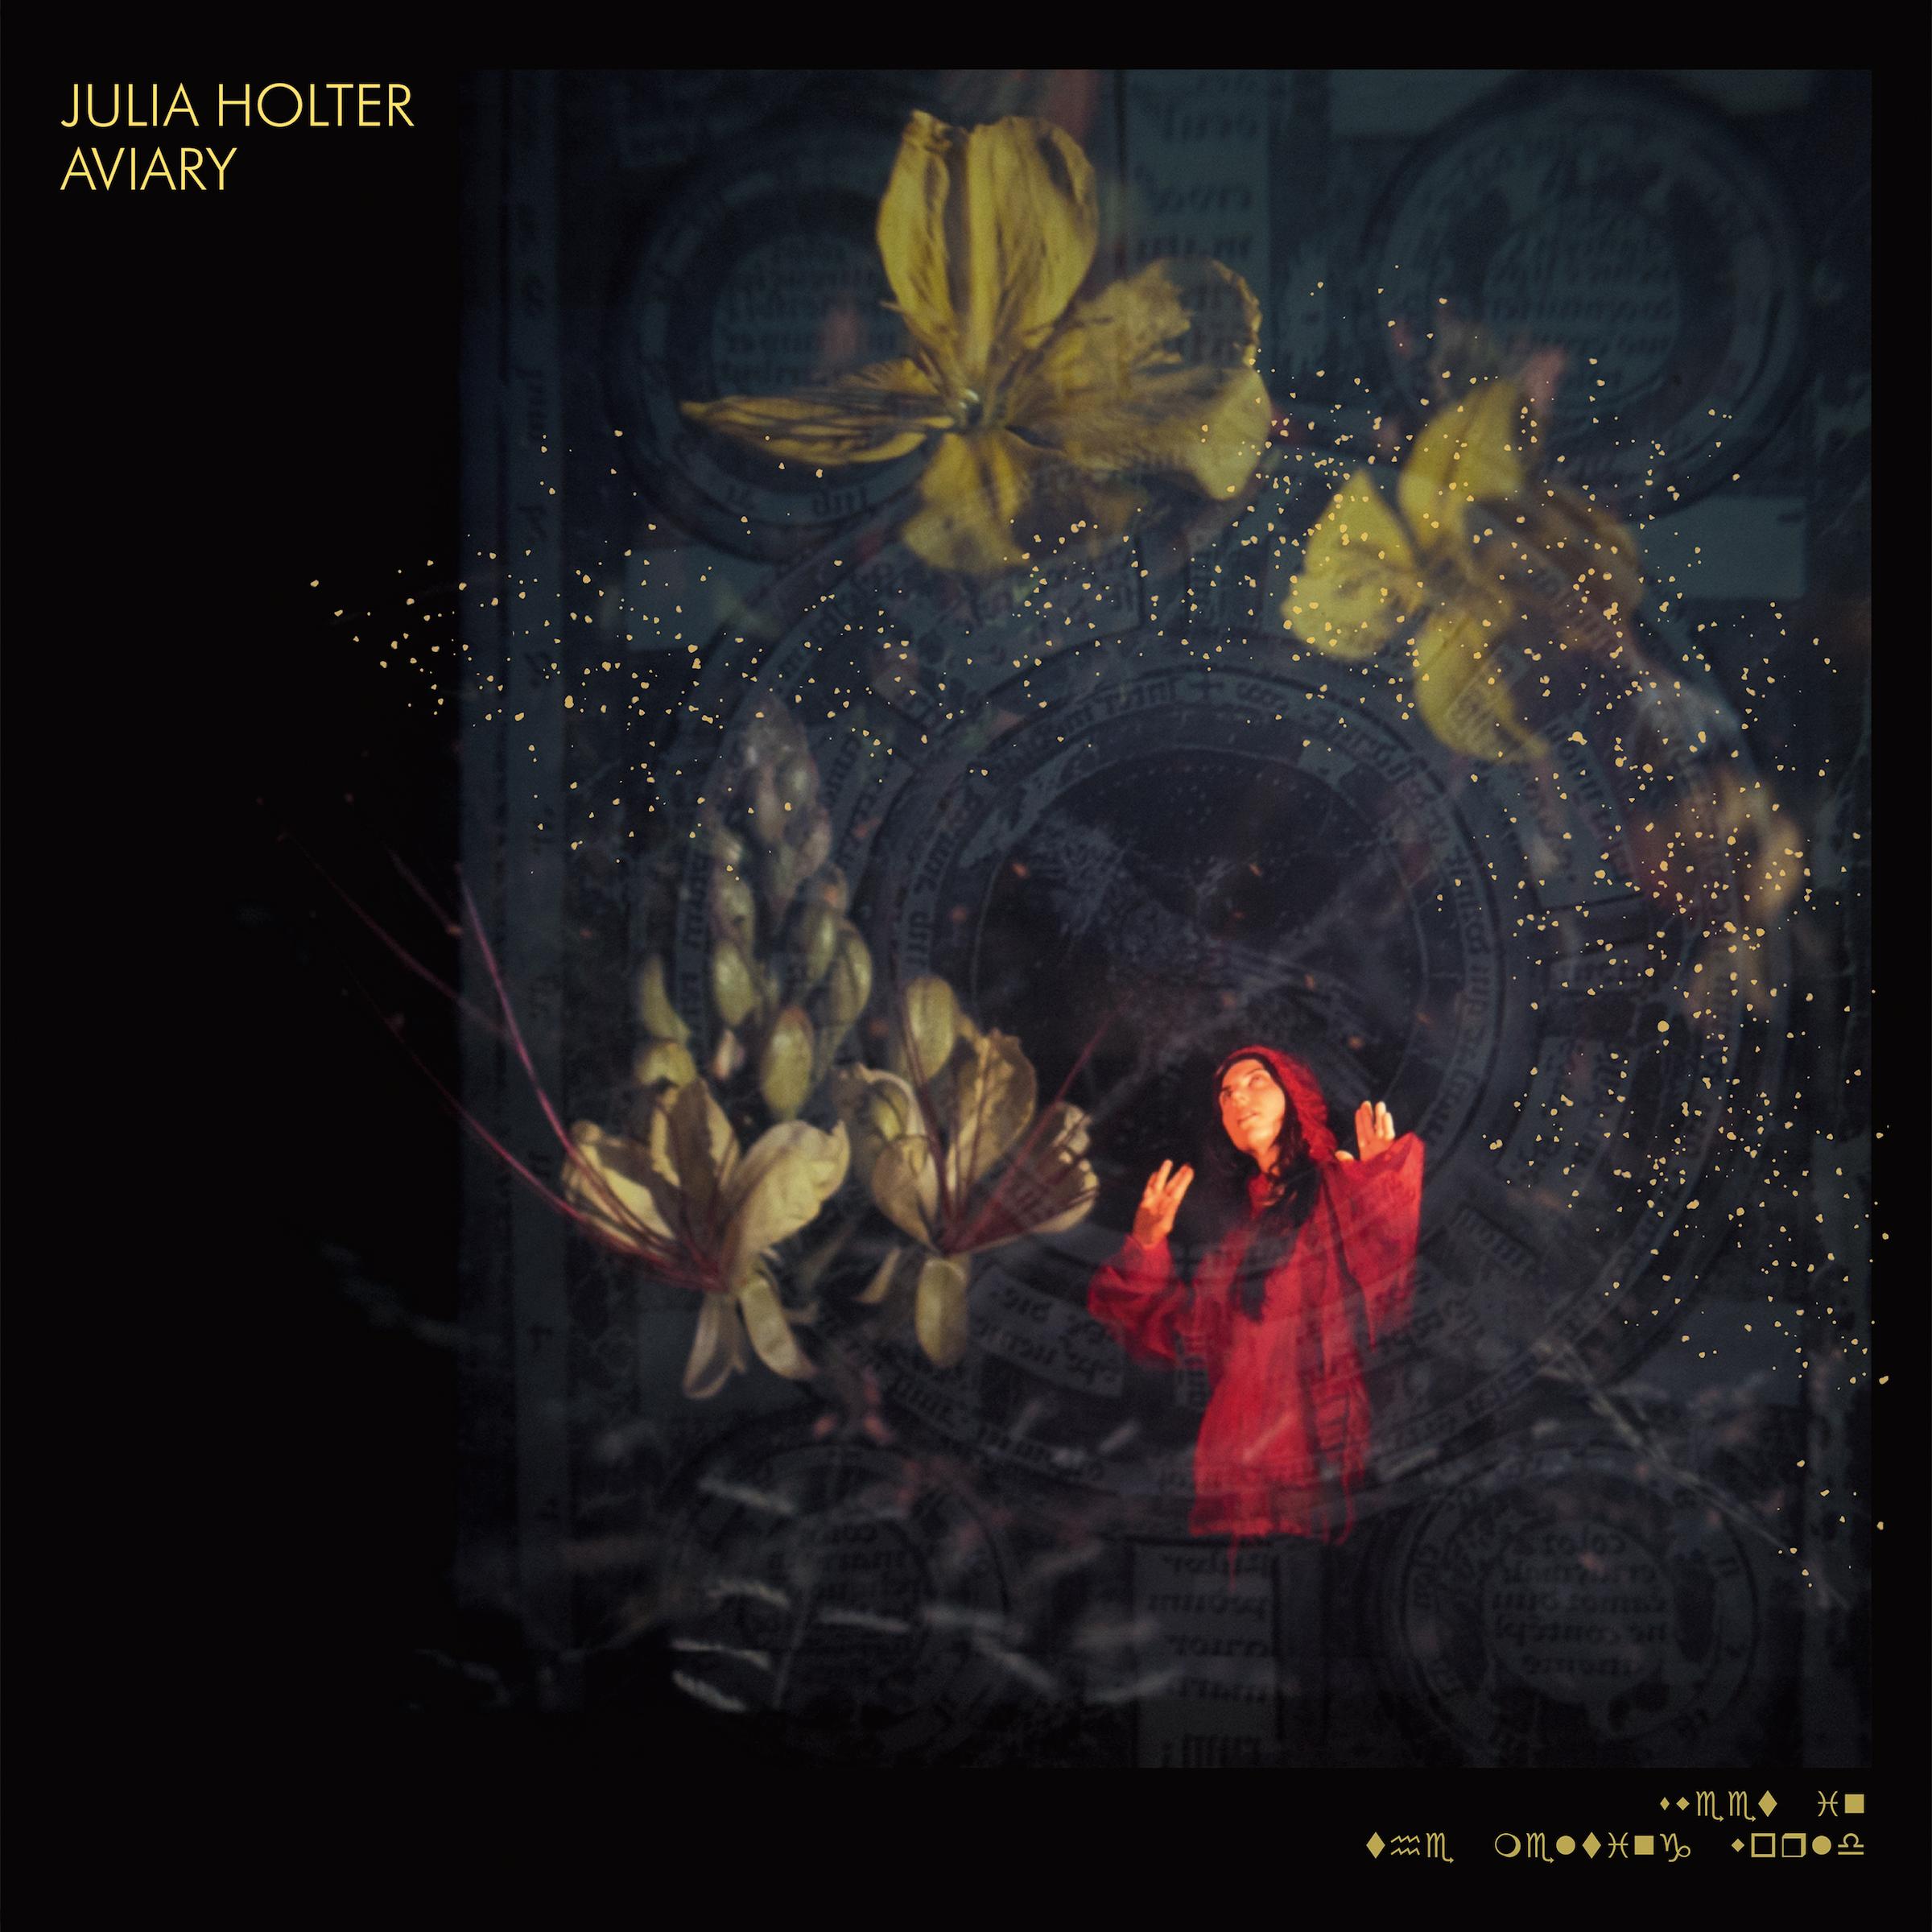 Julia Holter Aviary Album Cover Artwork